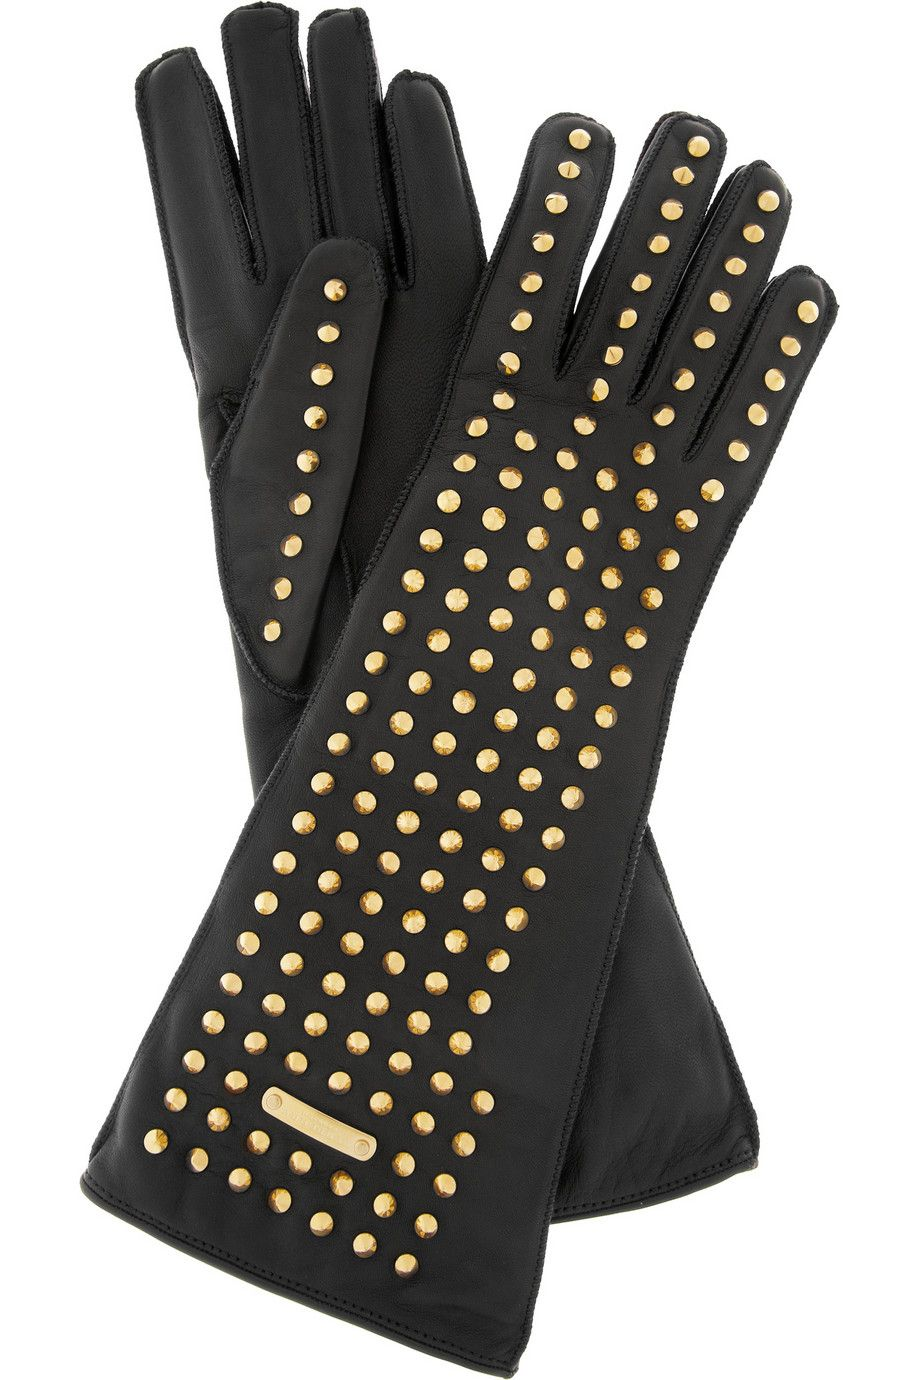 Evening-Gloves-0620